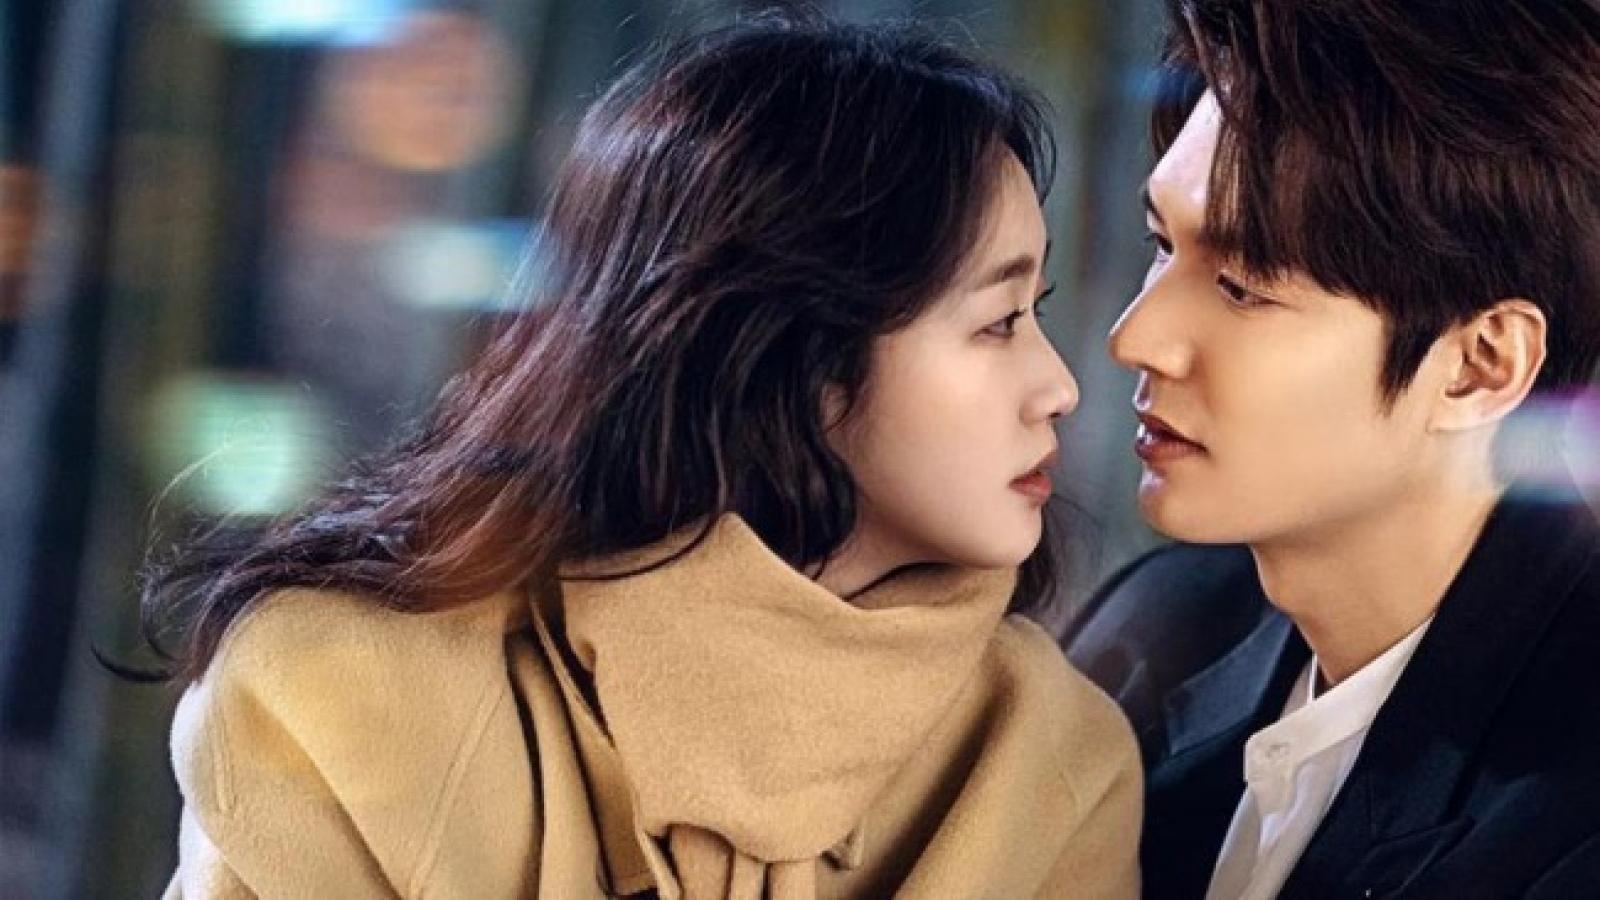 Khán giả phấn khích khi Lee Min Ho bất ngờ cầu hôn Kim Go Eun